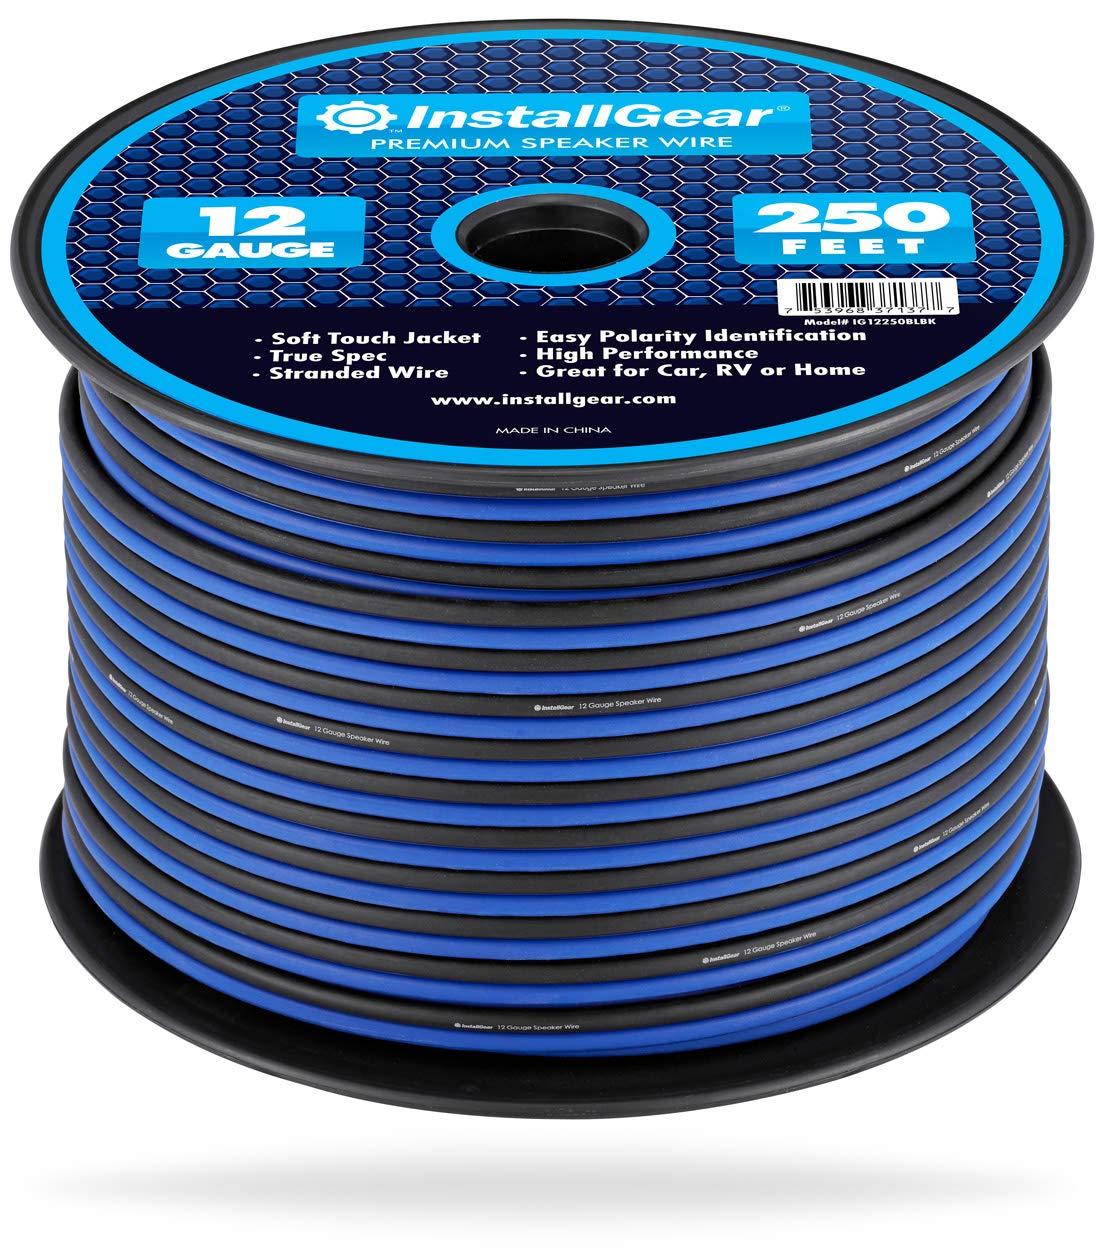 InstallGear 12 Gauge Speaker Wire (250-feet - Blue/Black) by InstallGear